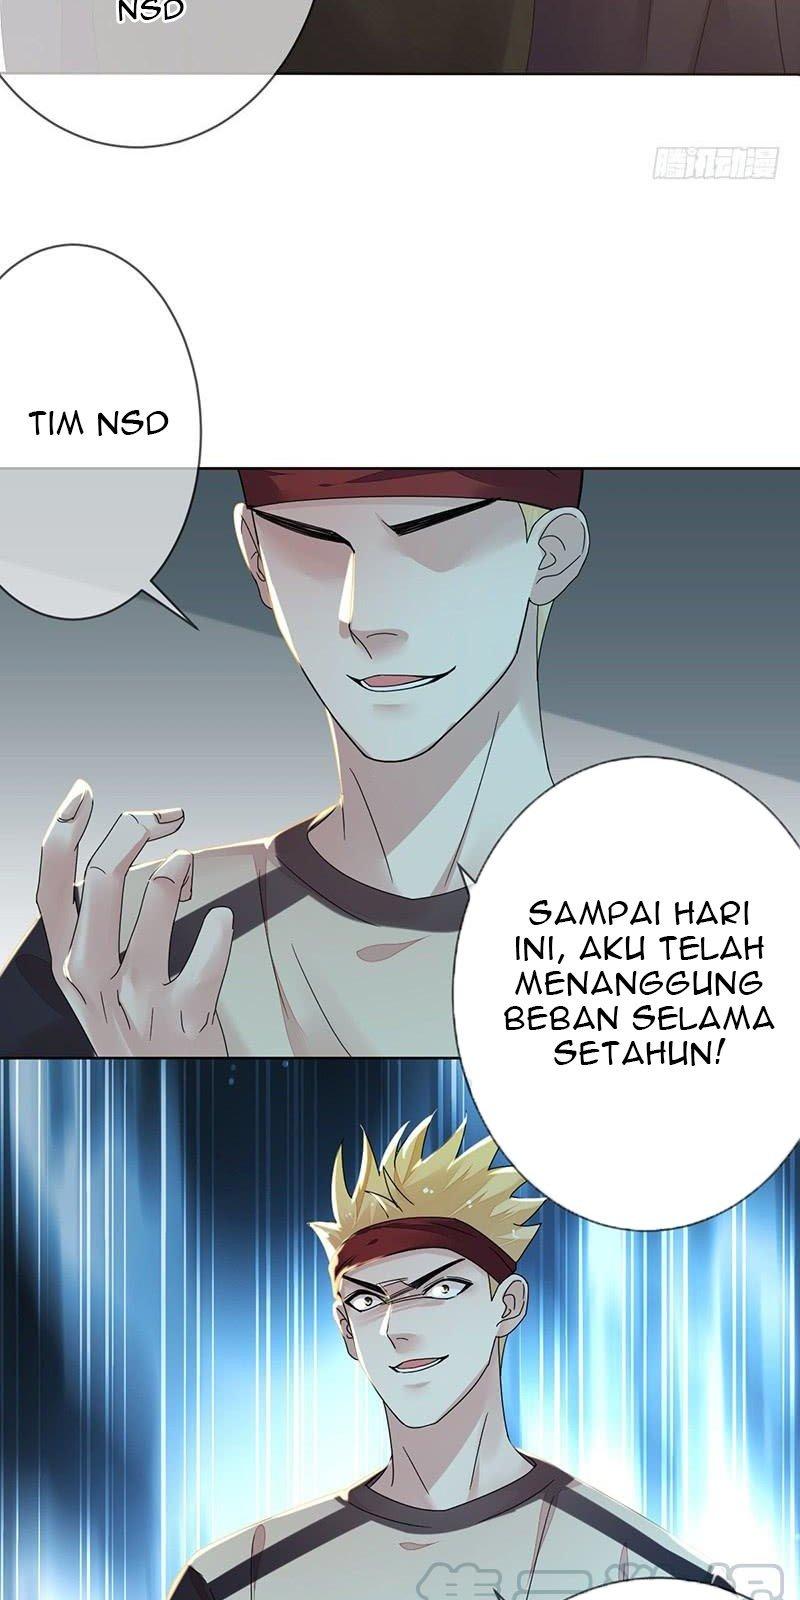 Nsd Gaming Chapter 164